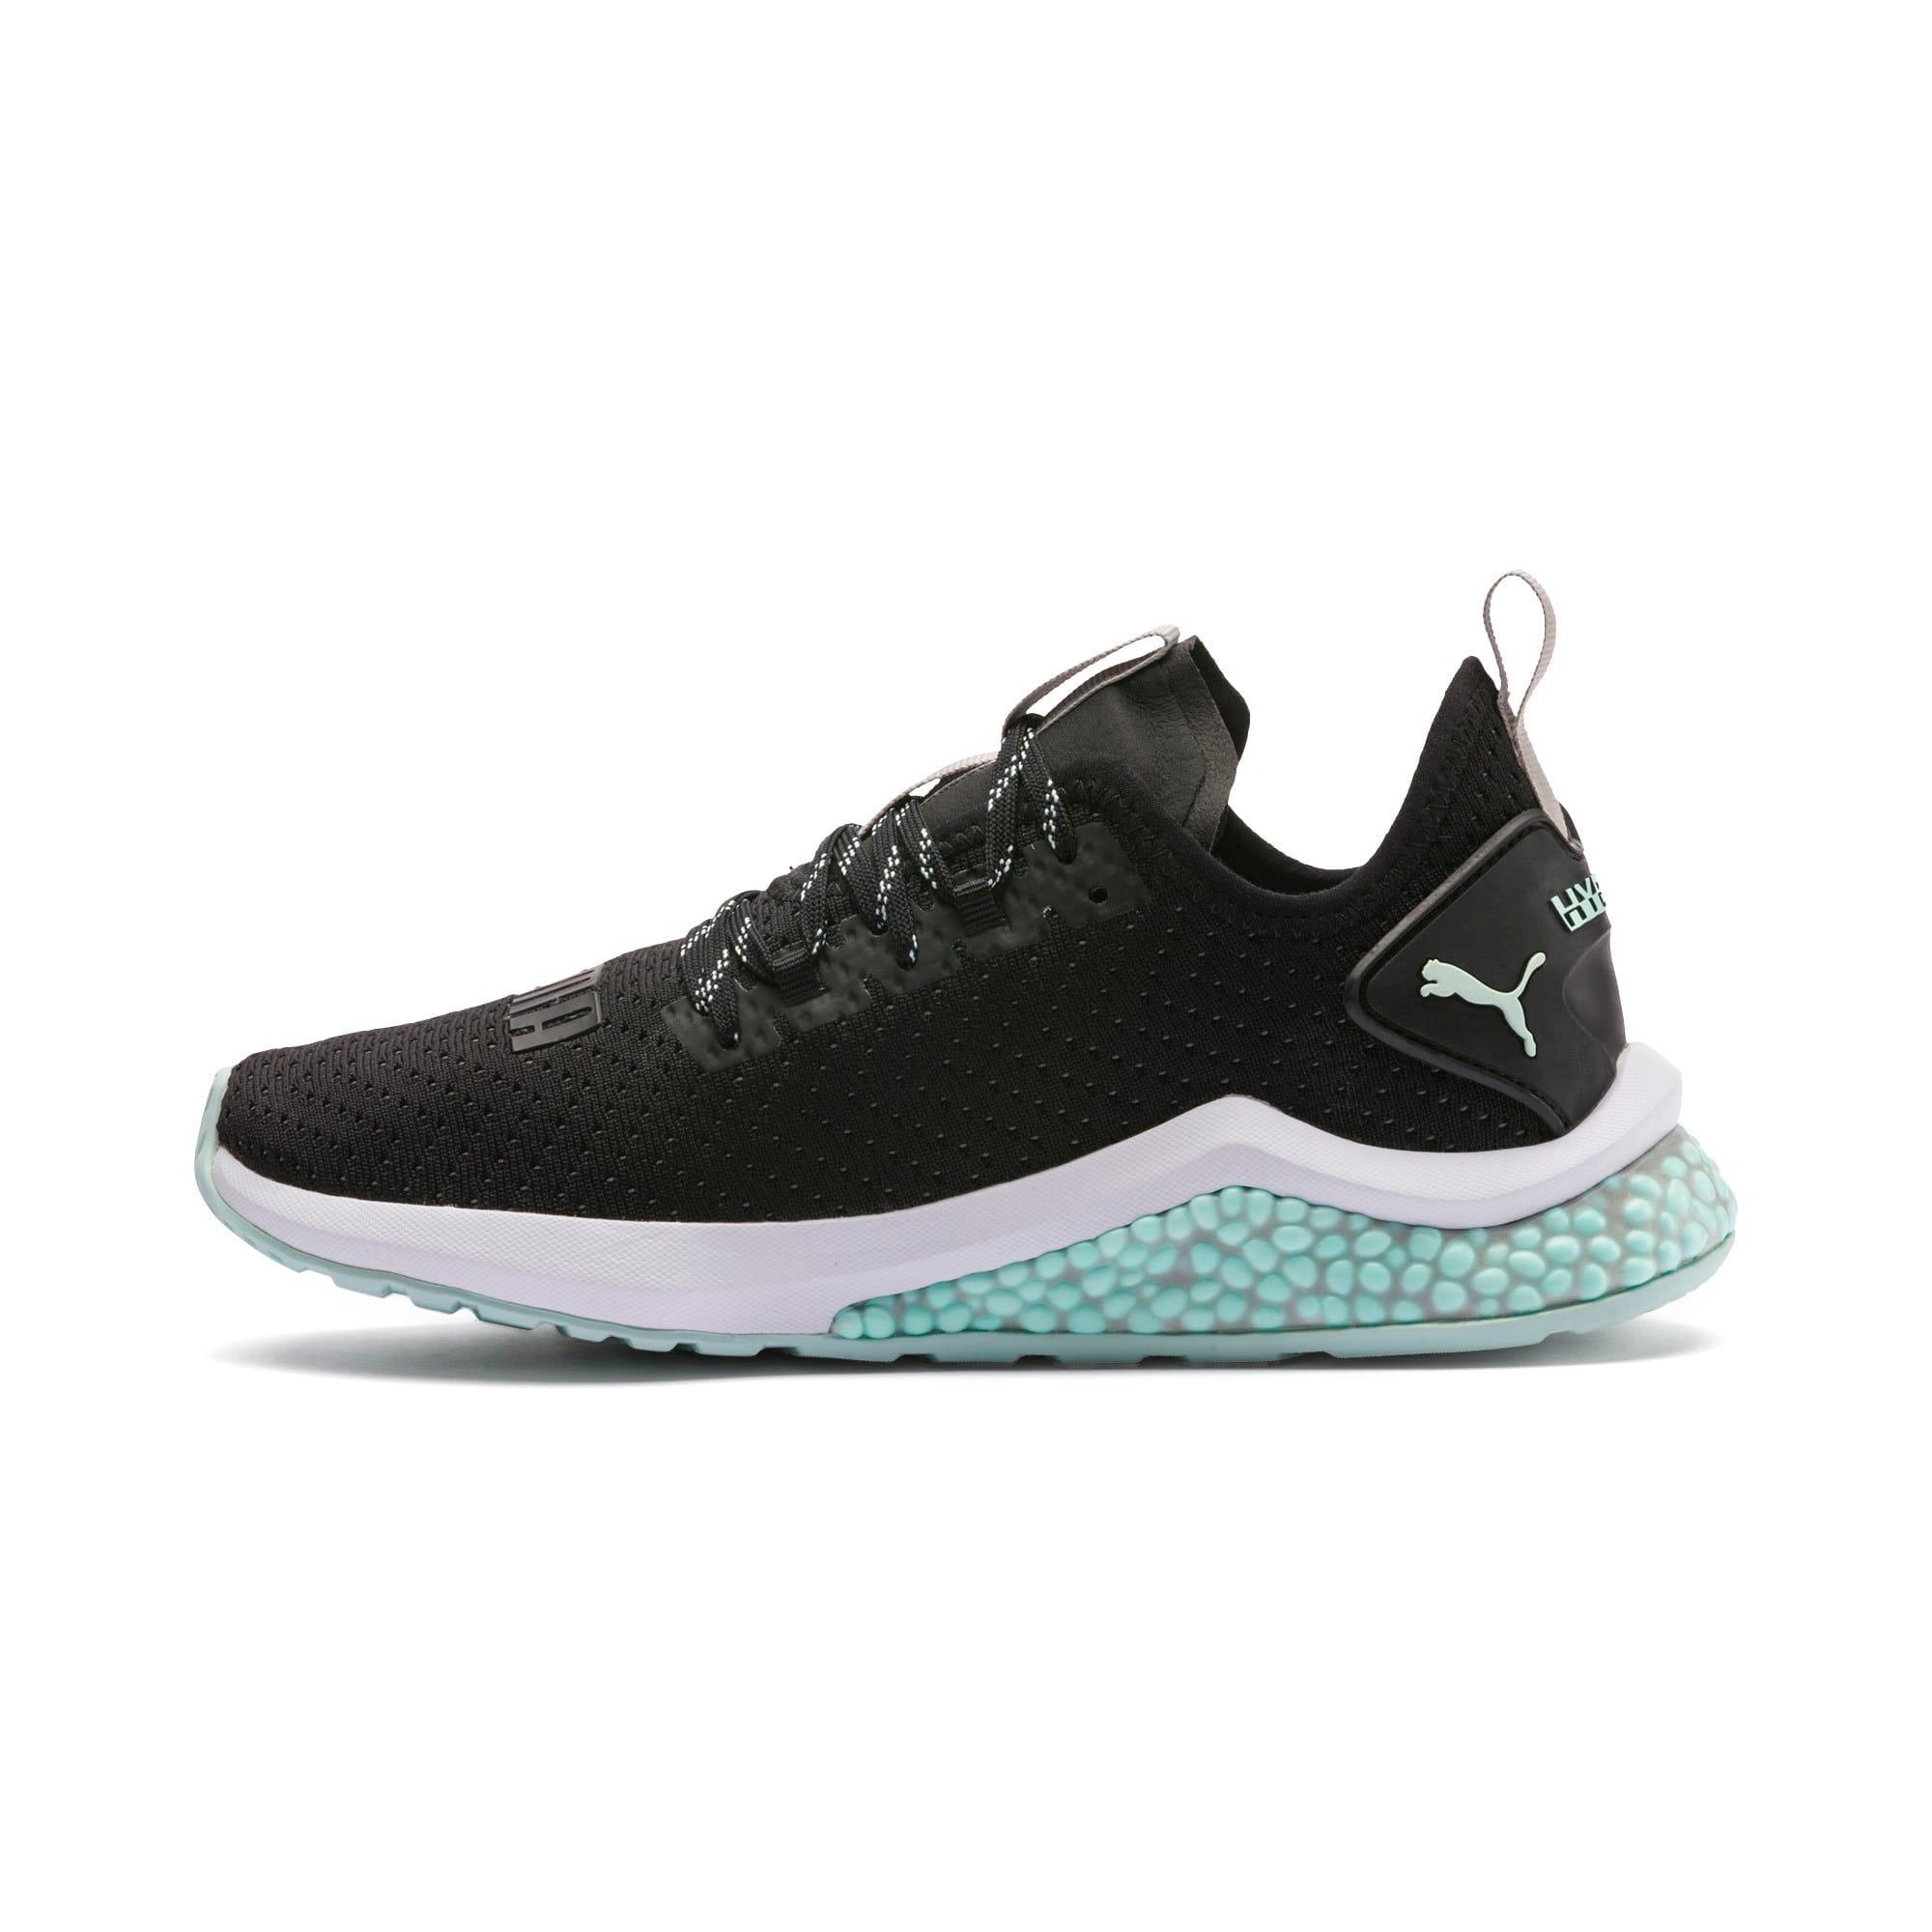 Thumbnail 1 of HYBRID NX Trailblazer Women's Running Shoes, Black-Fair Aqua-Pale Pink, medium